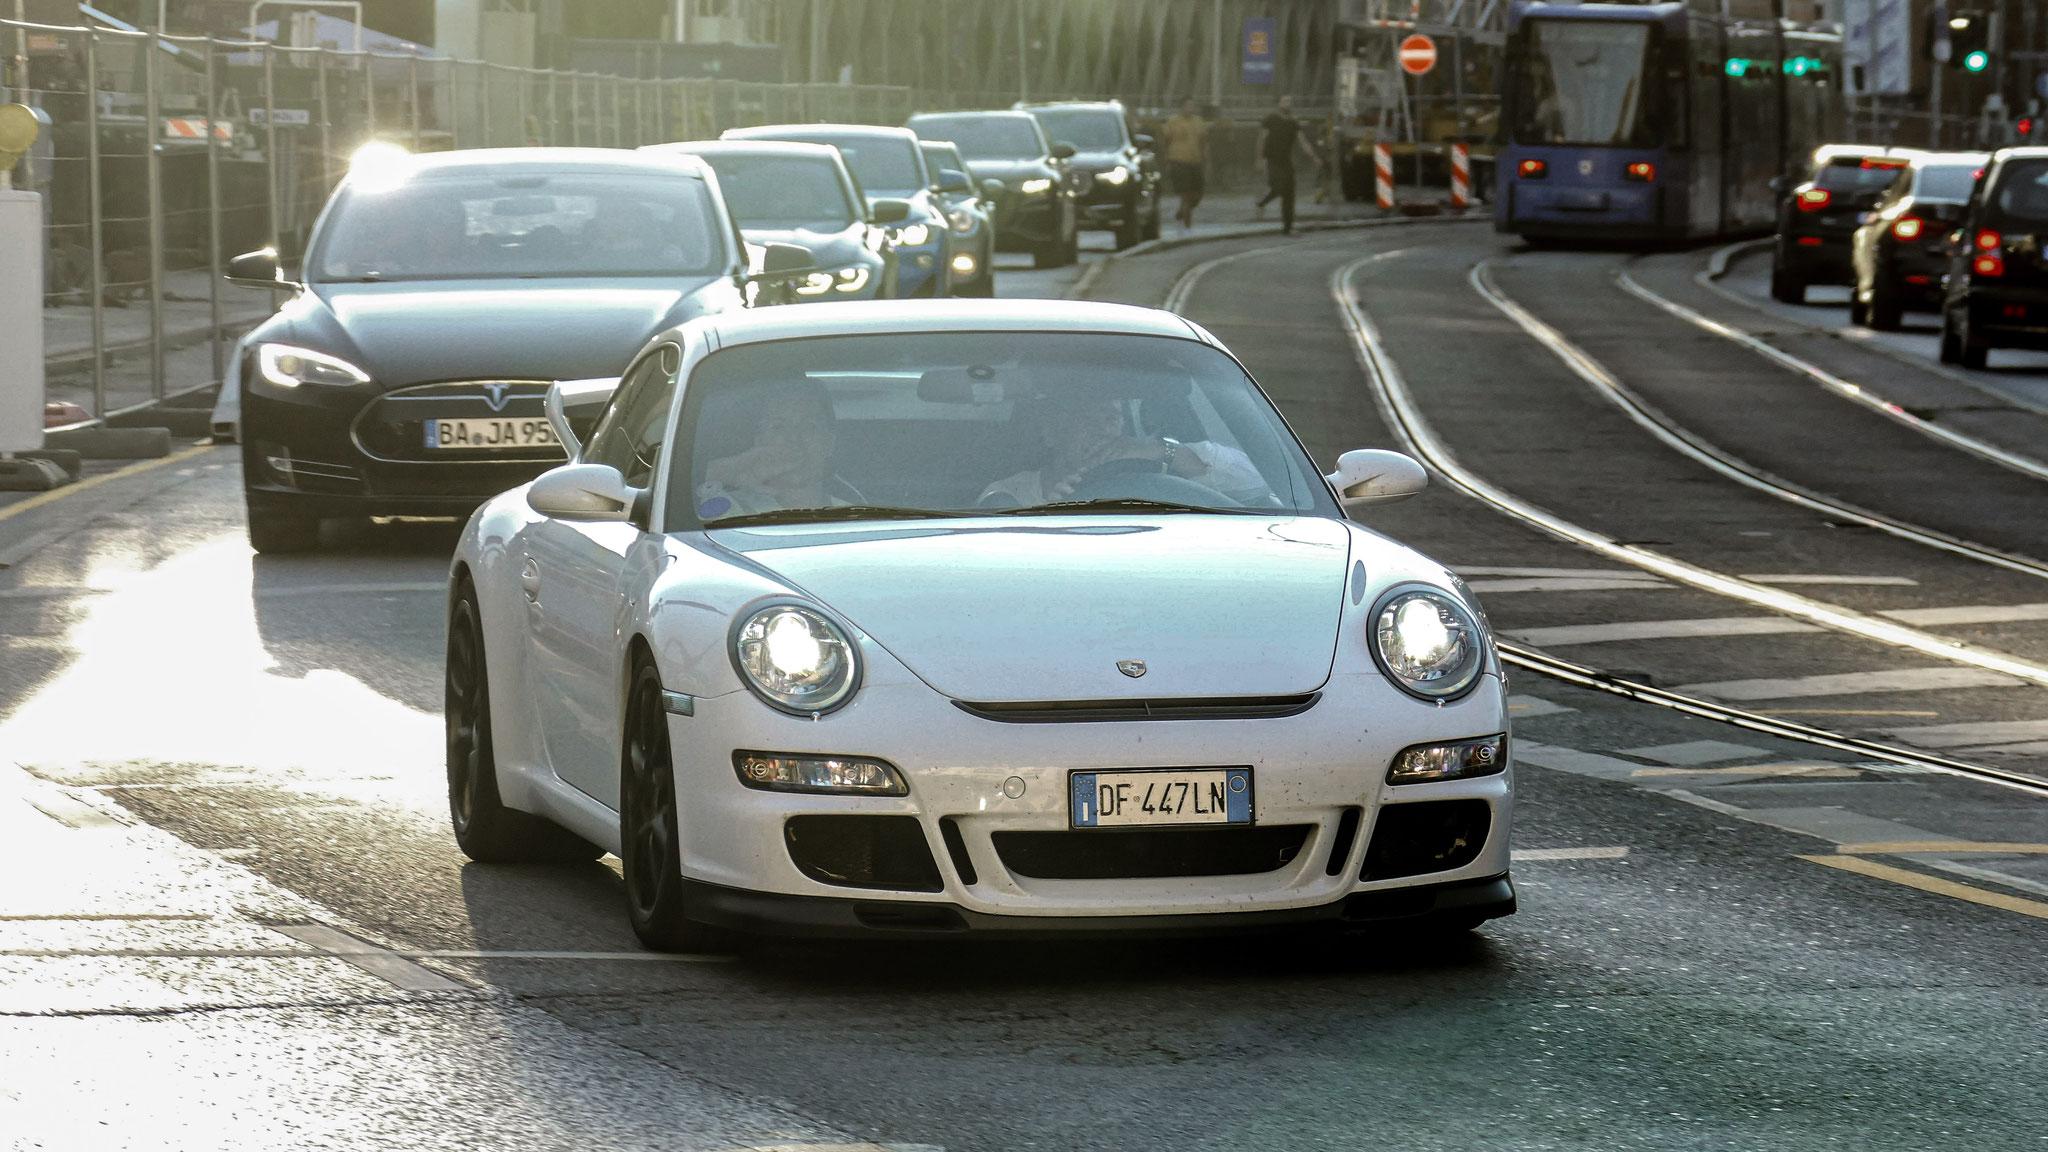 Porsche GT3 997 - DF-447-LN (ITA)